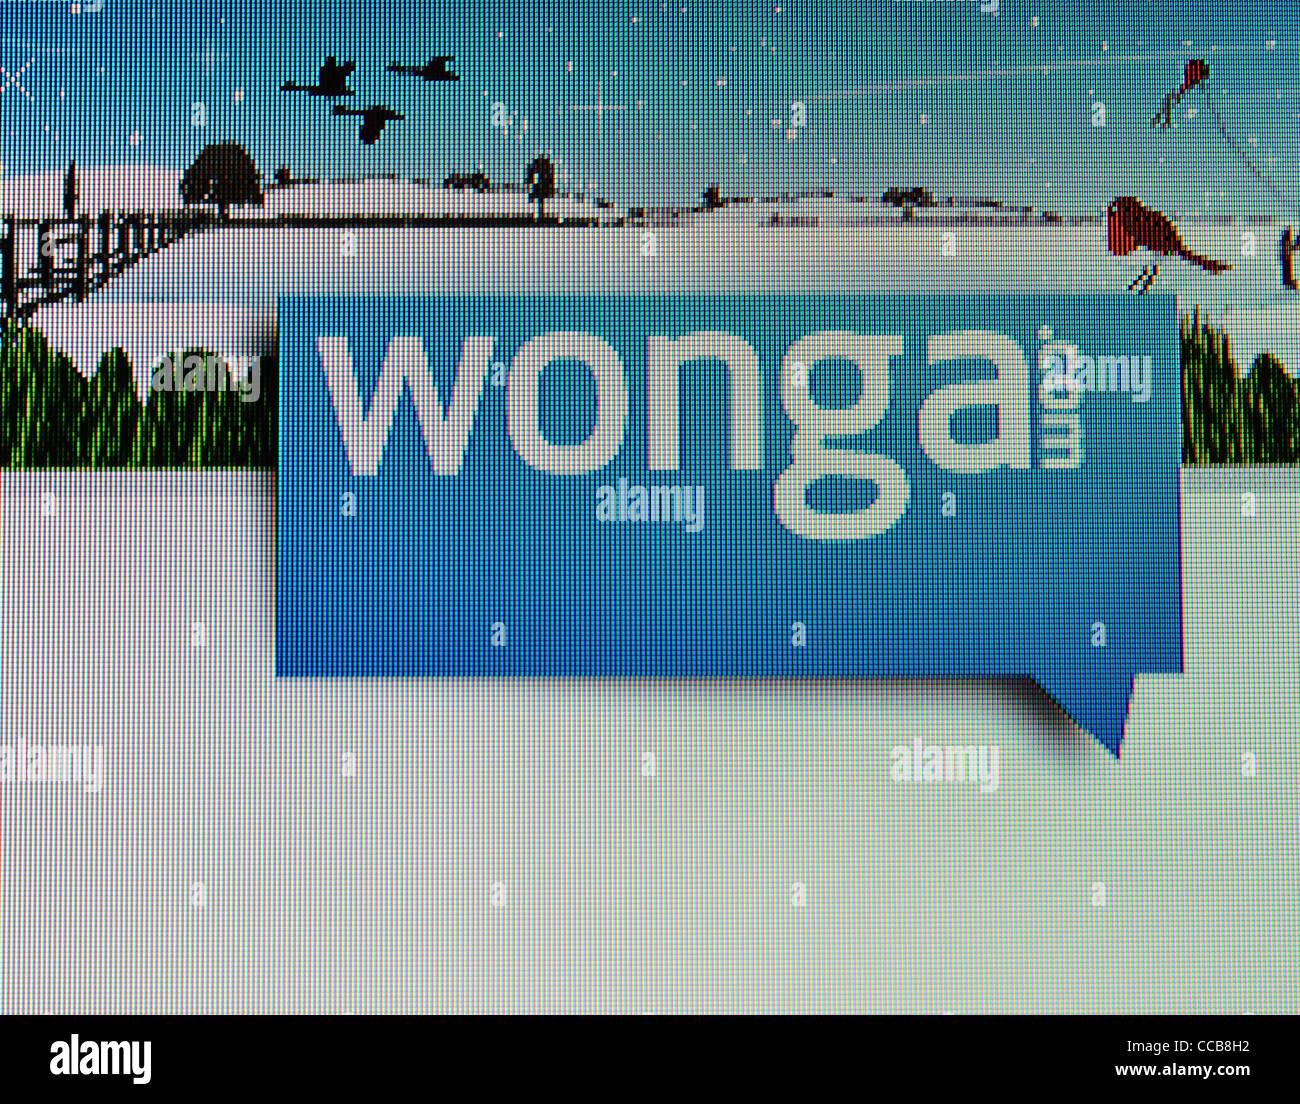 wonga.com instant cash loans web site - Stock Image